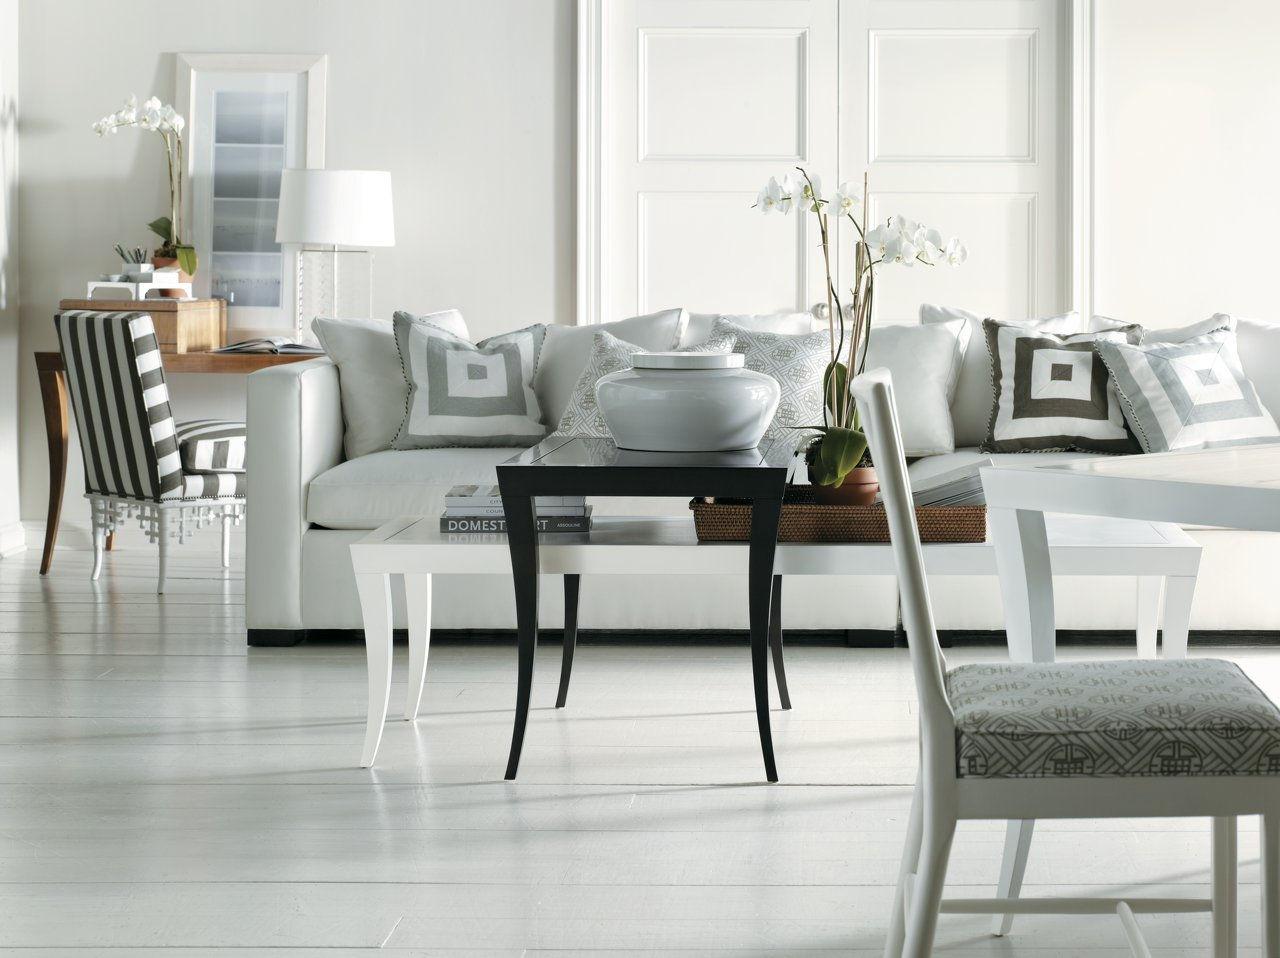 The Home Studio Interior Design Studio And Furniture Showroom Accessories Pillows Grand